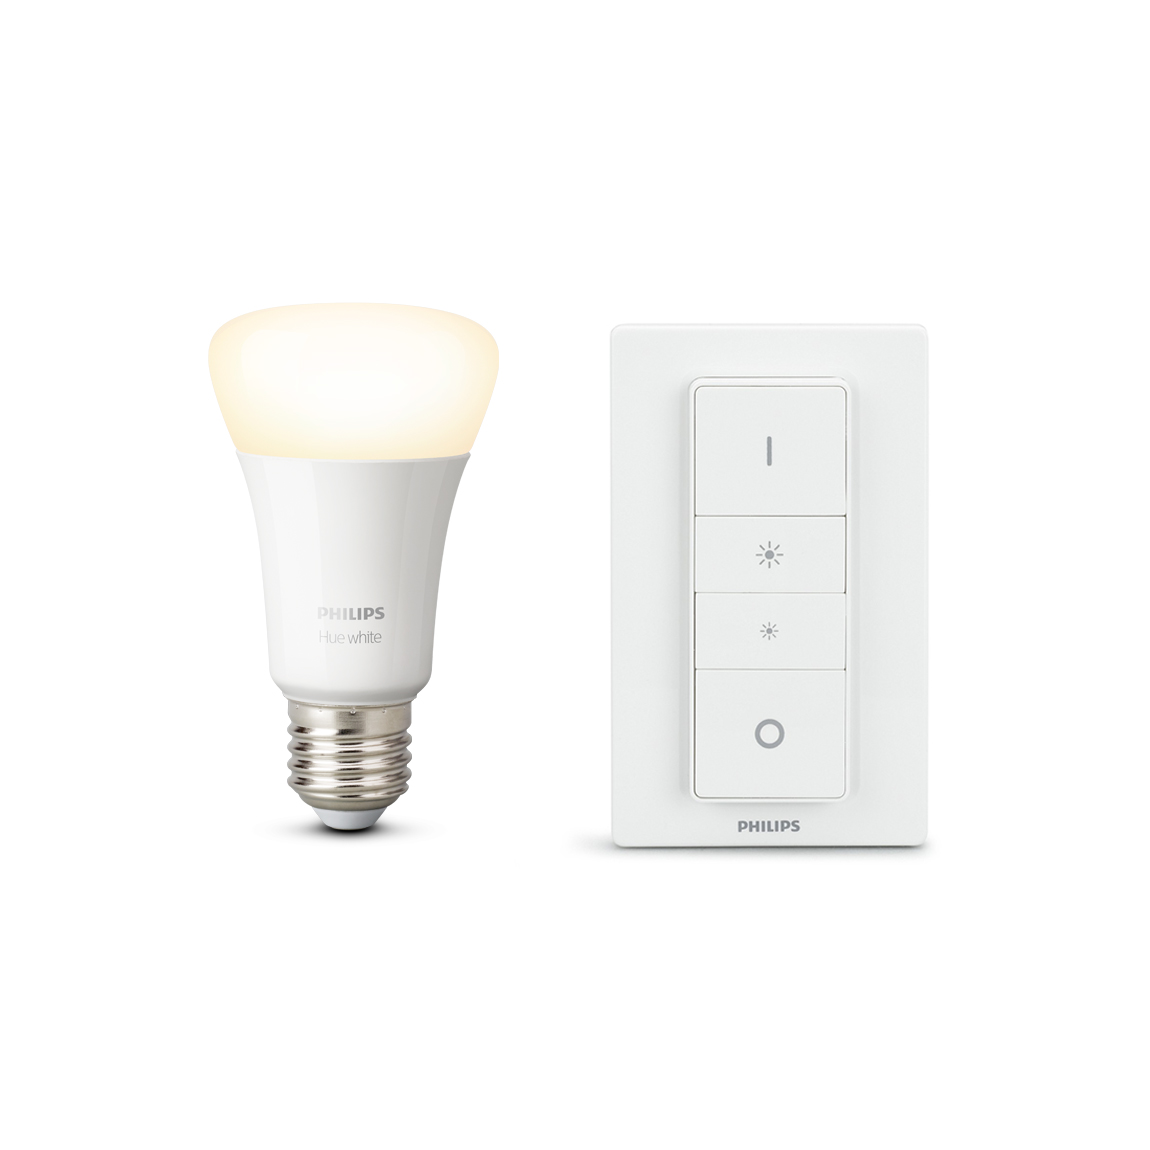 Philips Hue White E27 Bluetooth Dimmer Kit - Lample inkl. Dimmschalter - Weiß